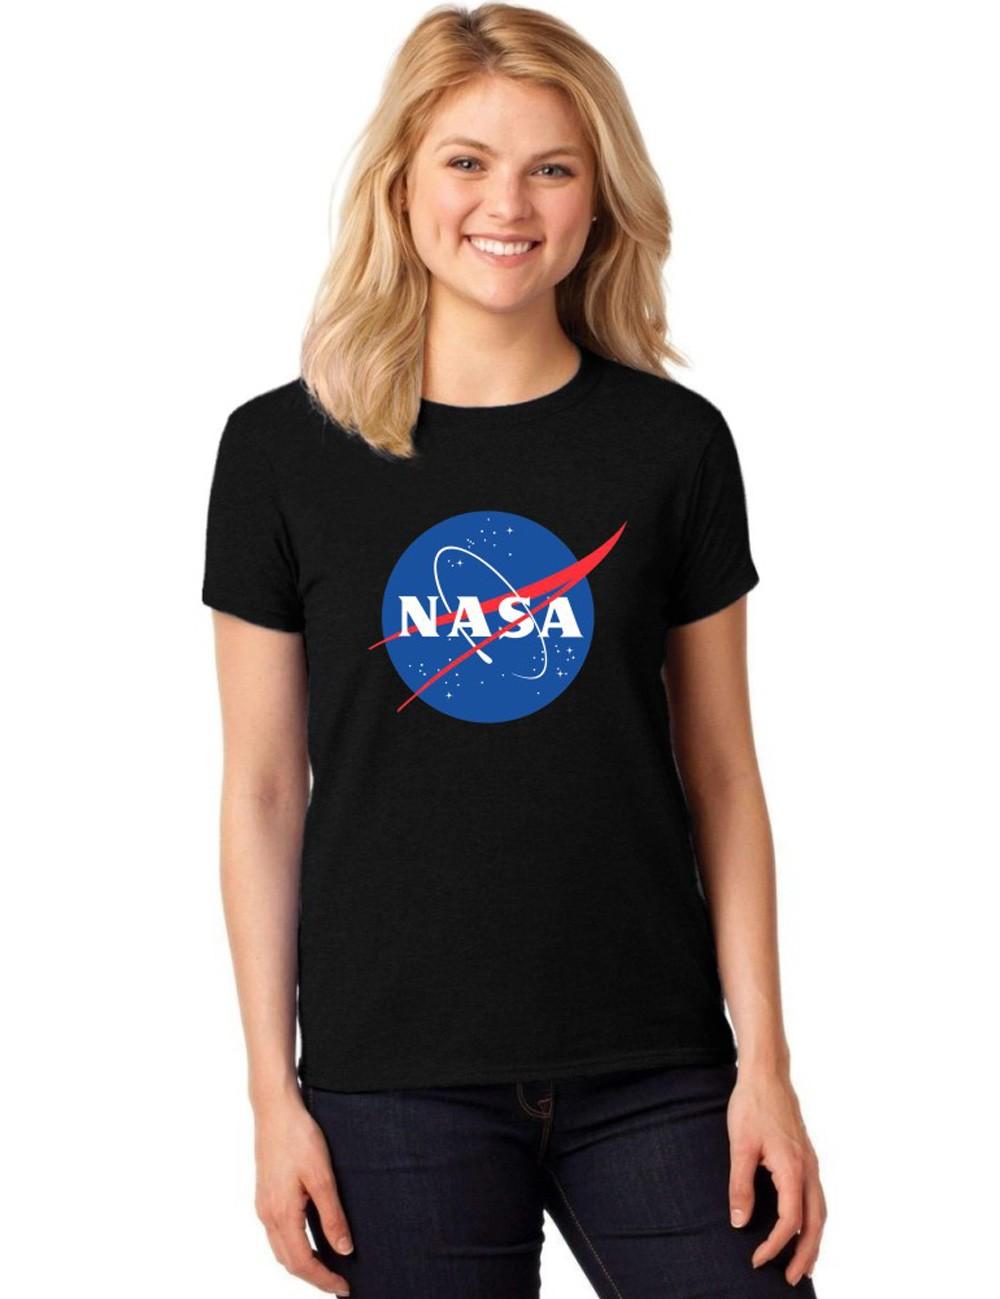 Camiseta Feminina T-Shirt Nasa Baby Look ER_113